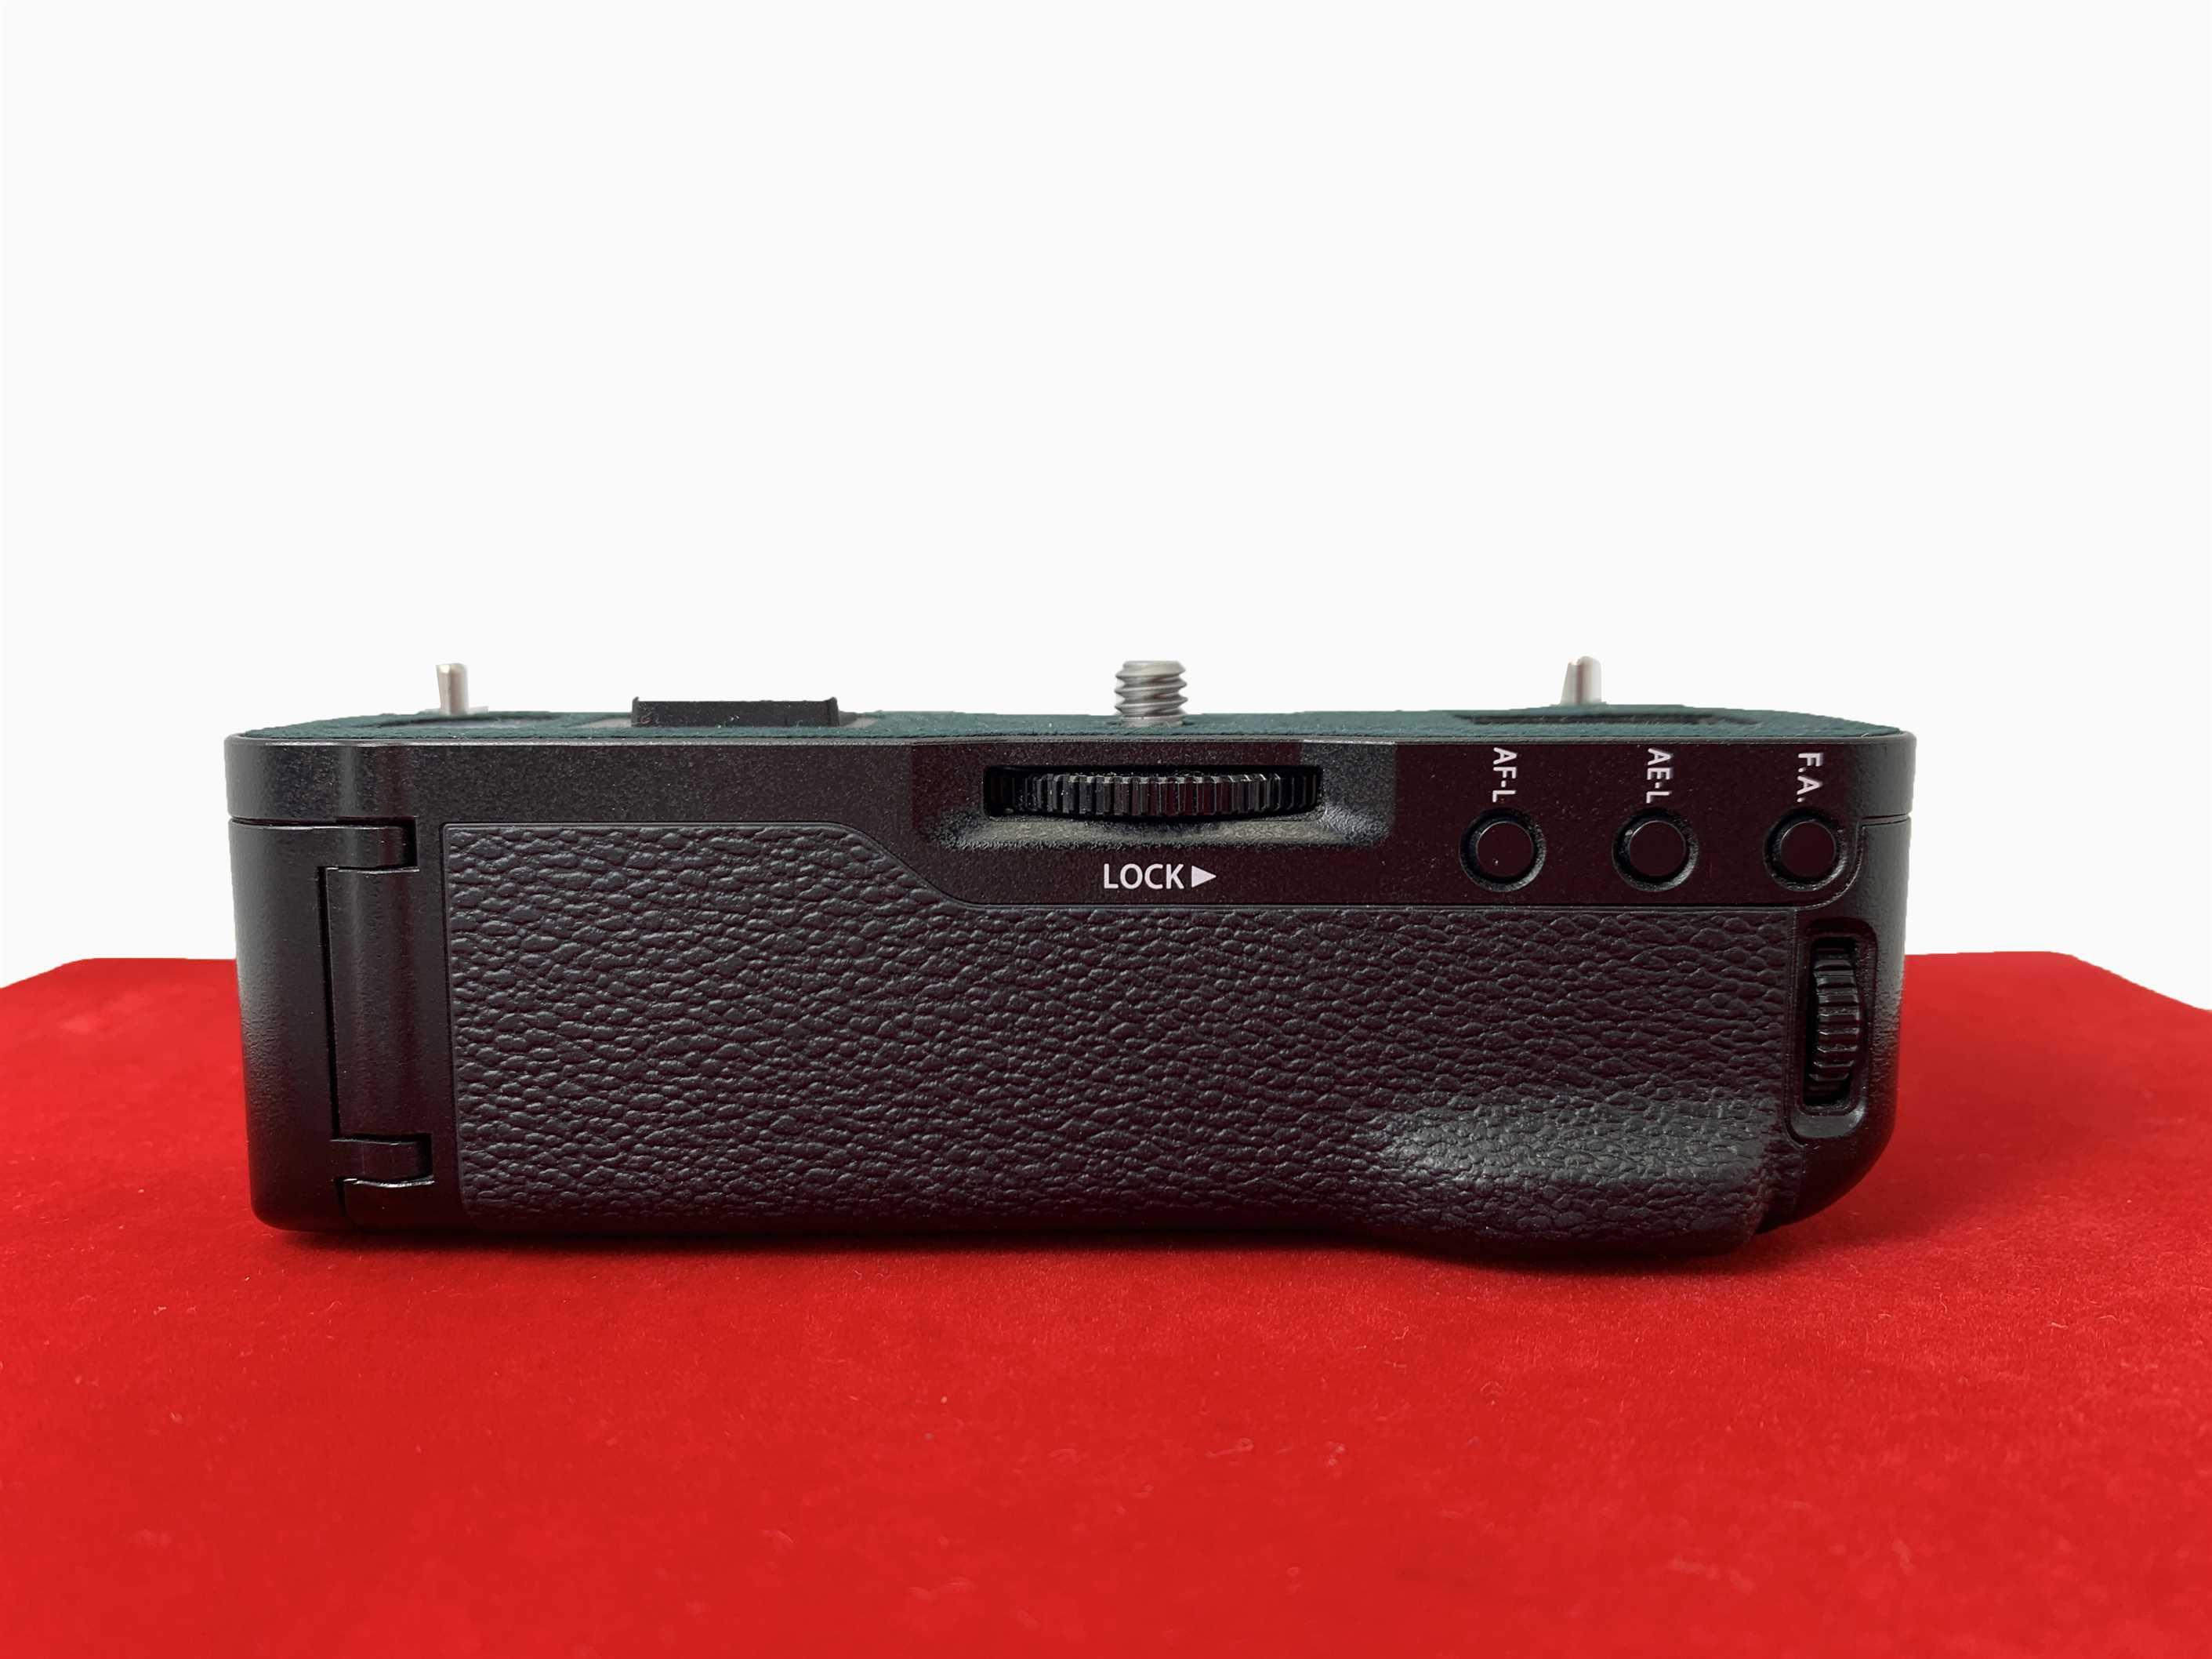 [USED-PJ33] Fujifilm VG-XT1 Grip For (XT1) , 90% Like New Condition,(S/N:4D001256)